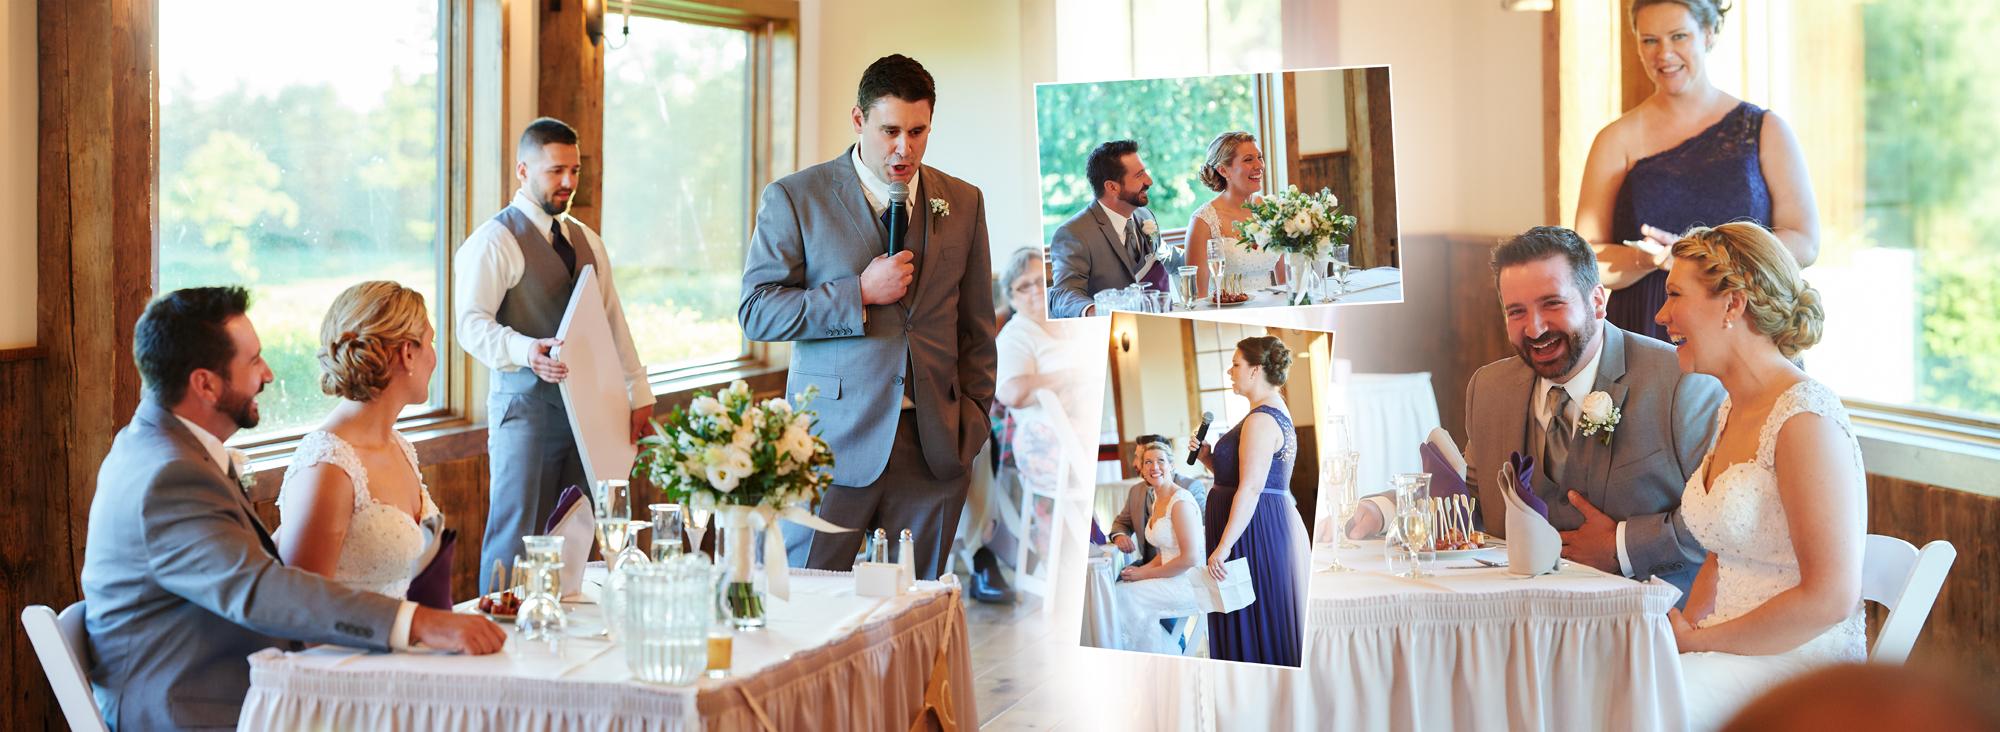 Dave_Soucy_APM_wedding_photography.026.jpg